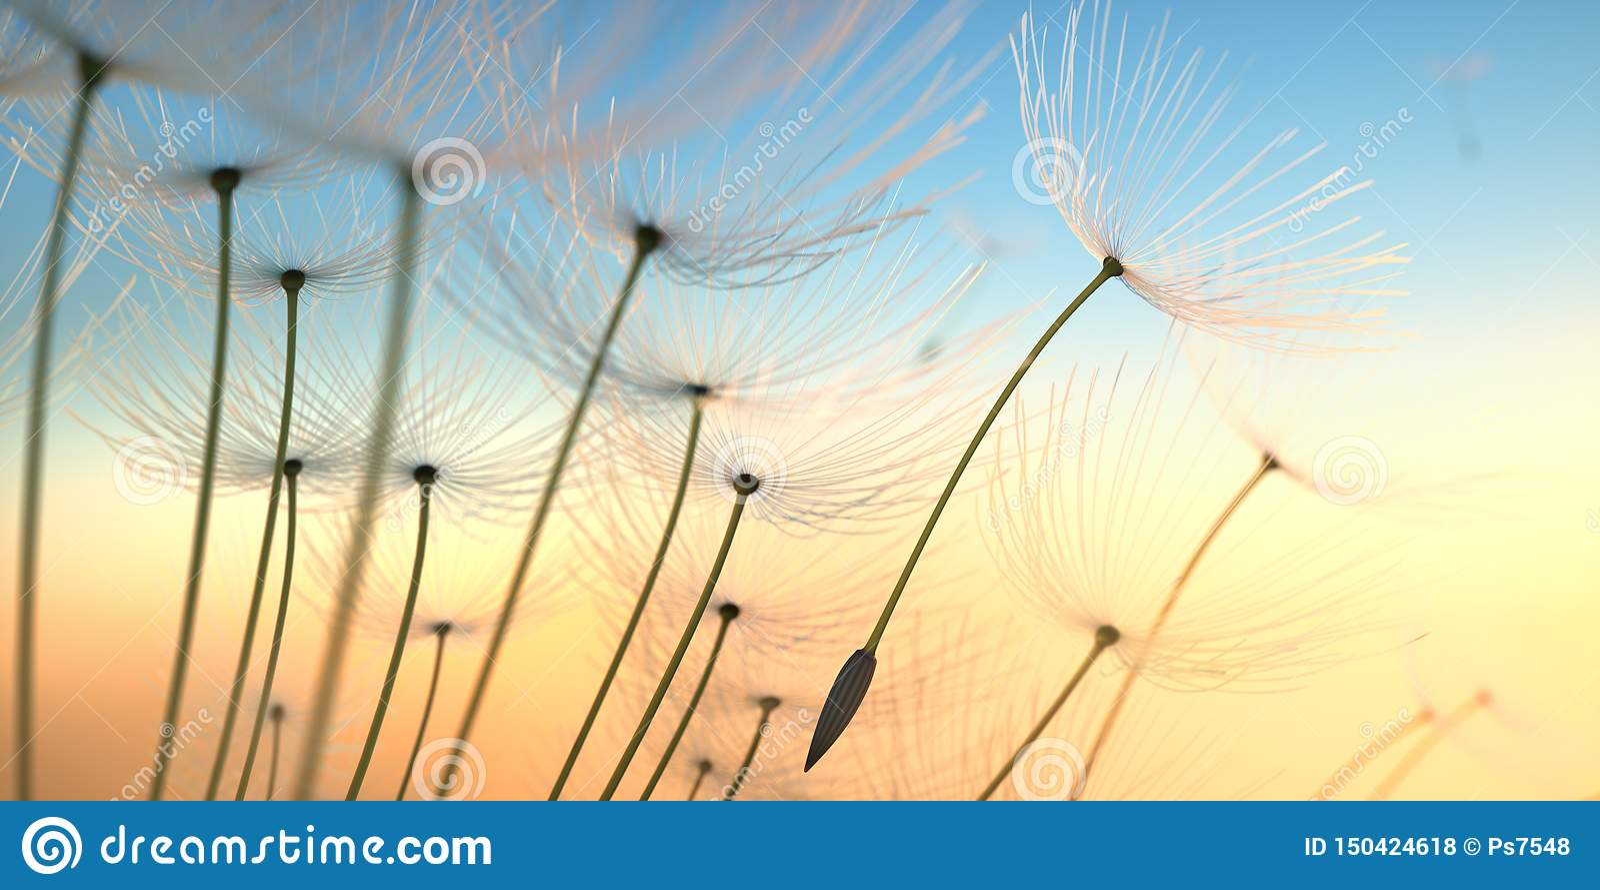 Dandelion seeds in the evening sun